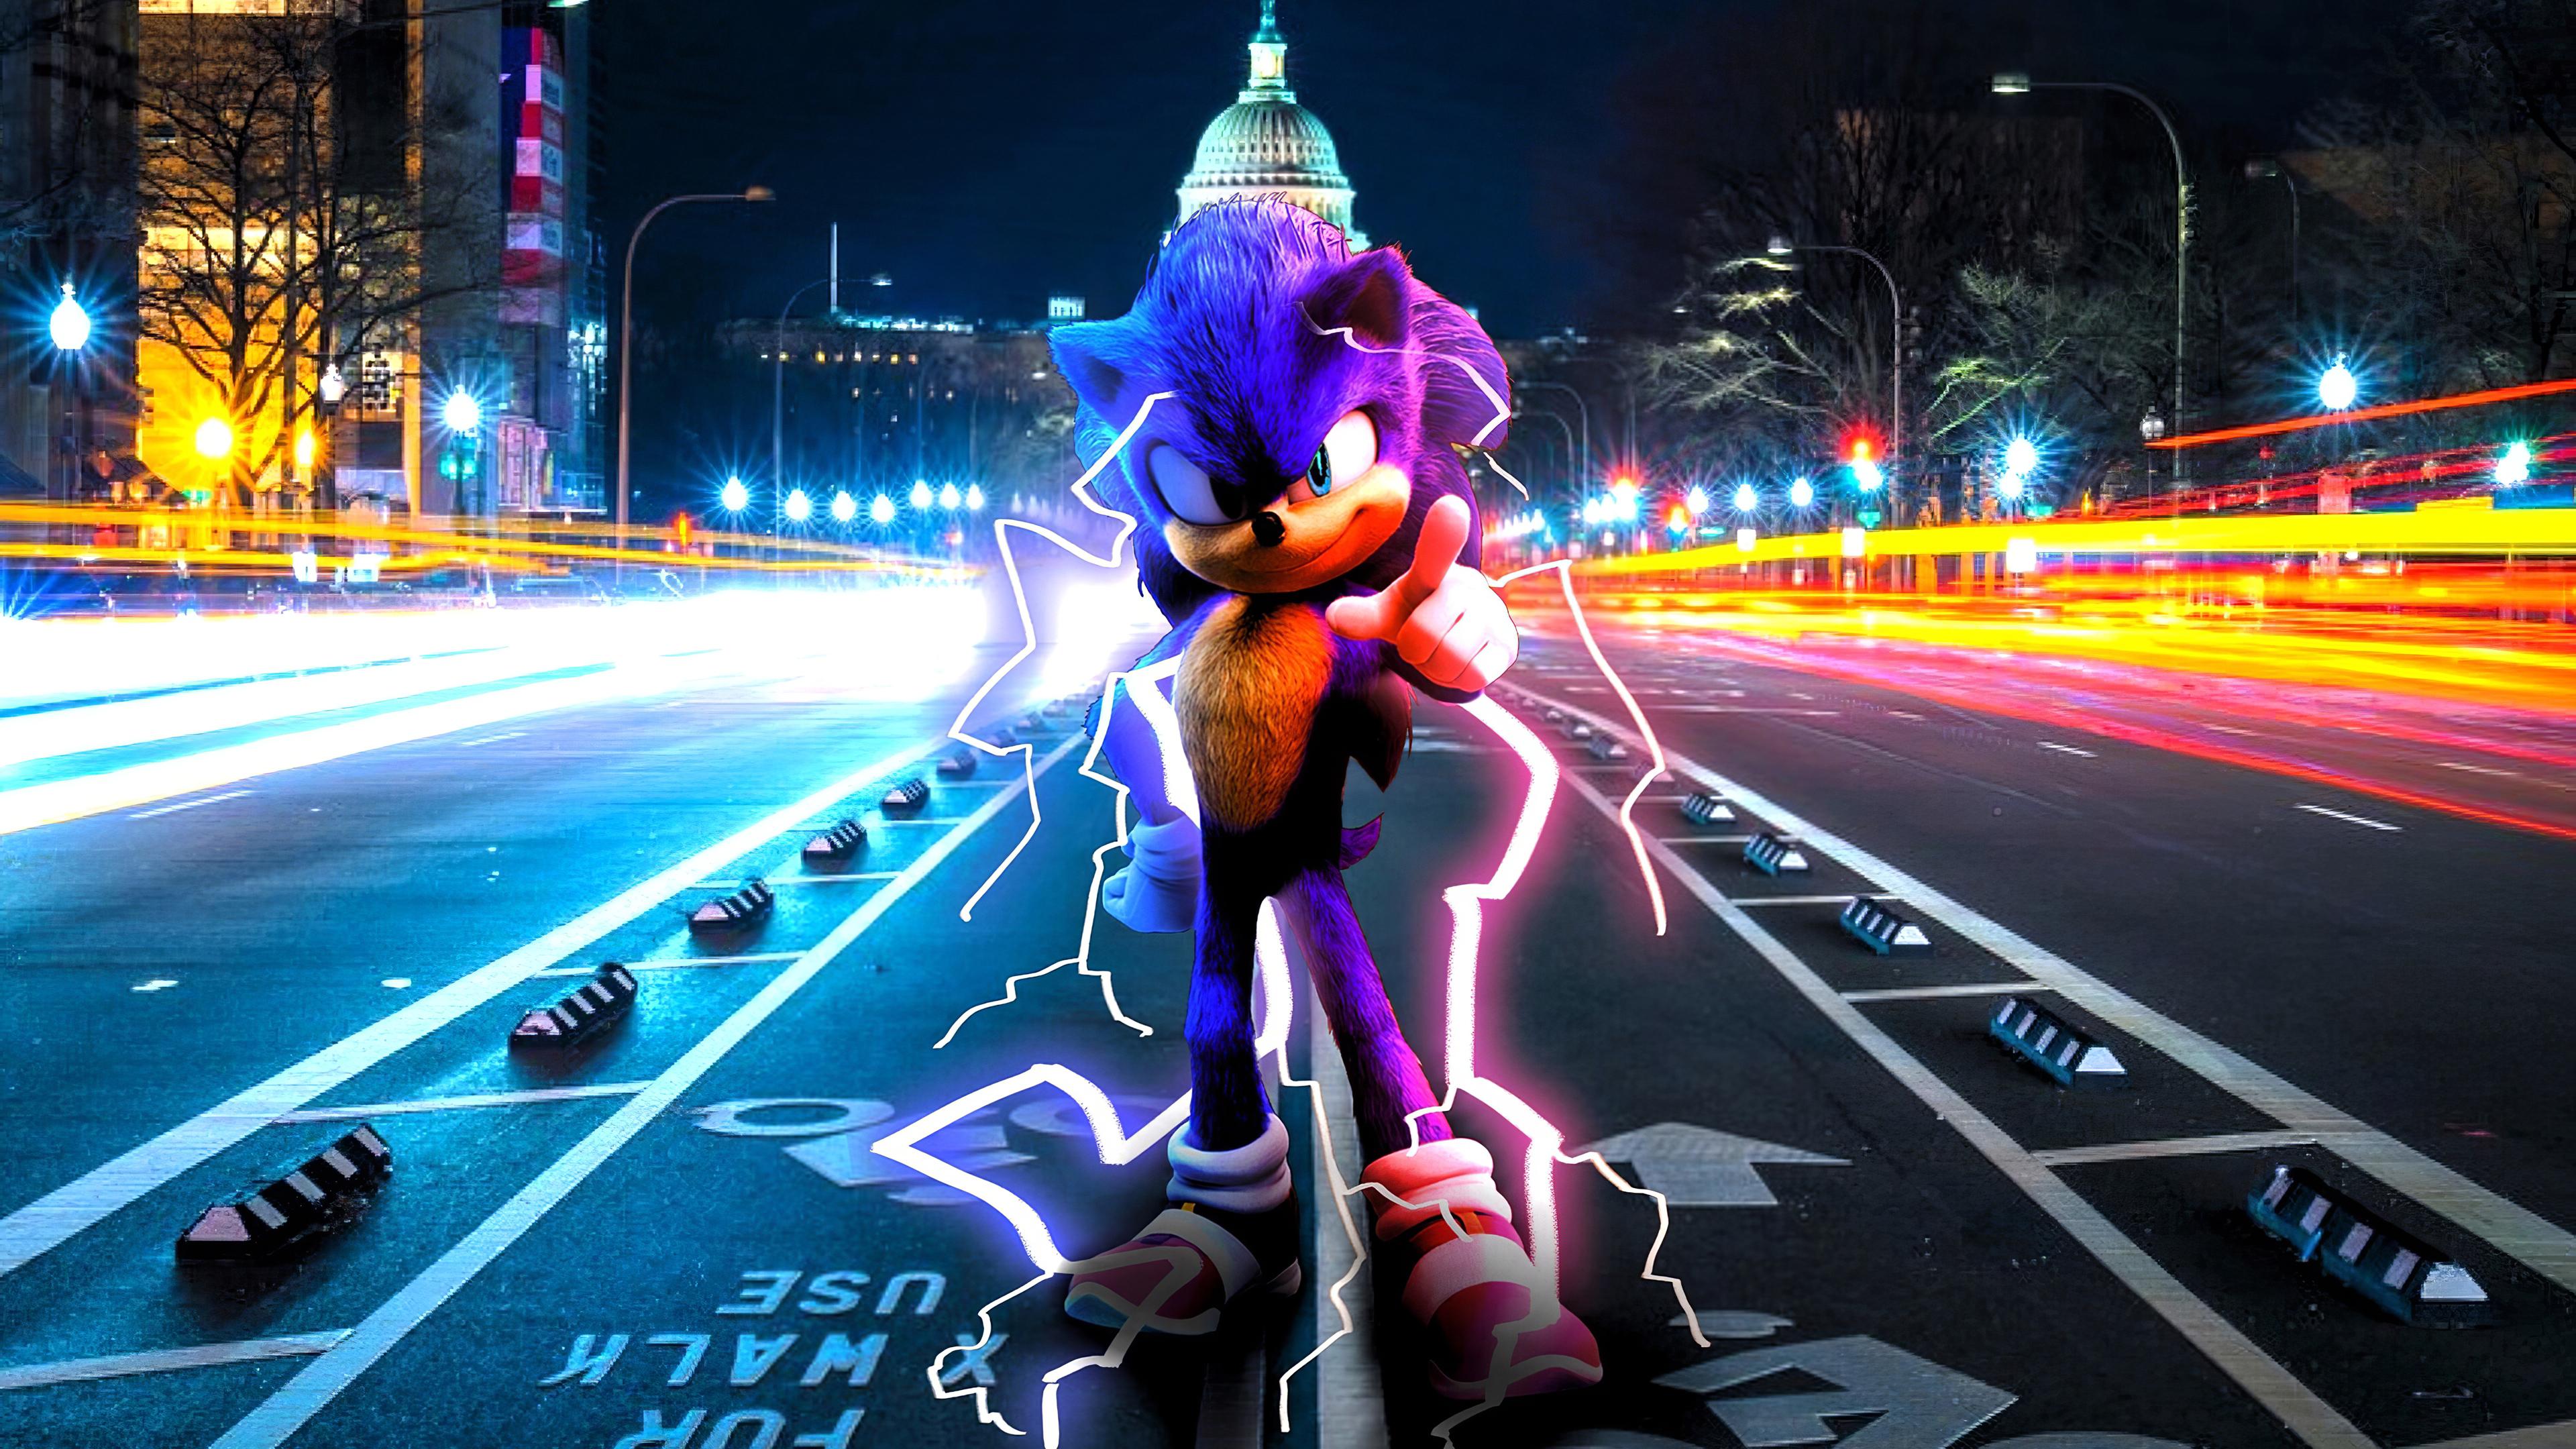 2020 sonic the hedgehog 1582152425 - 2020 Sonic The Hedgehog - 2020 Sonic The Hedgehog wallpapers, 2020 Sonic The Hedgehog 4k wallpapers